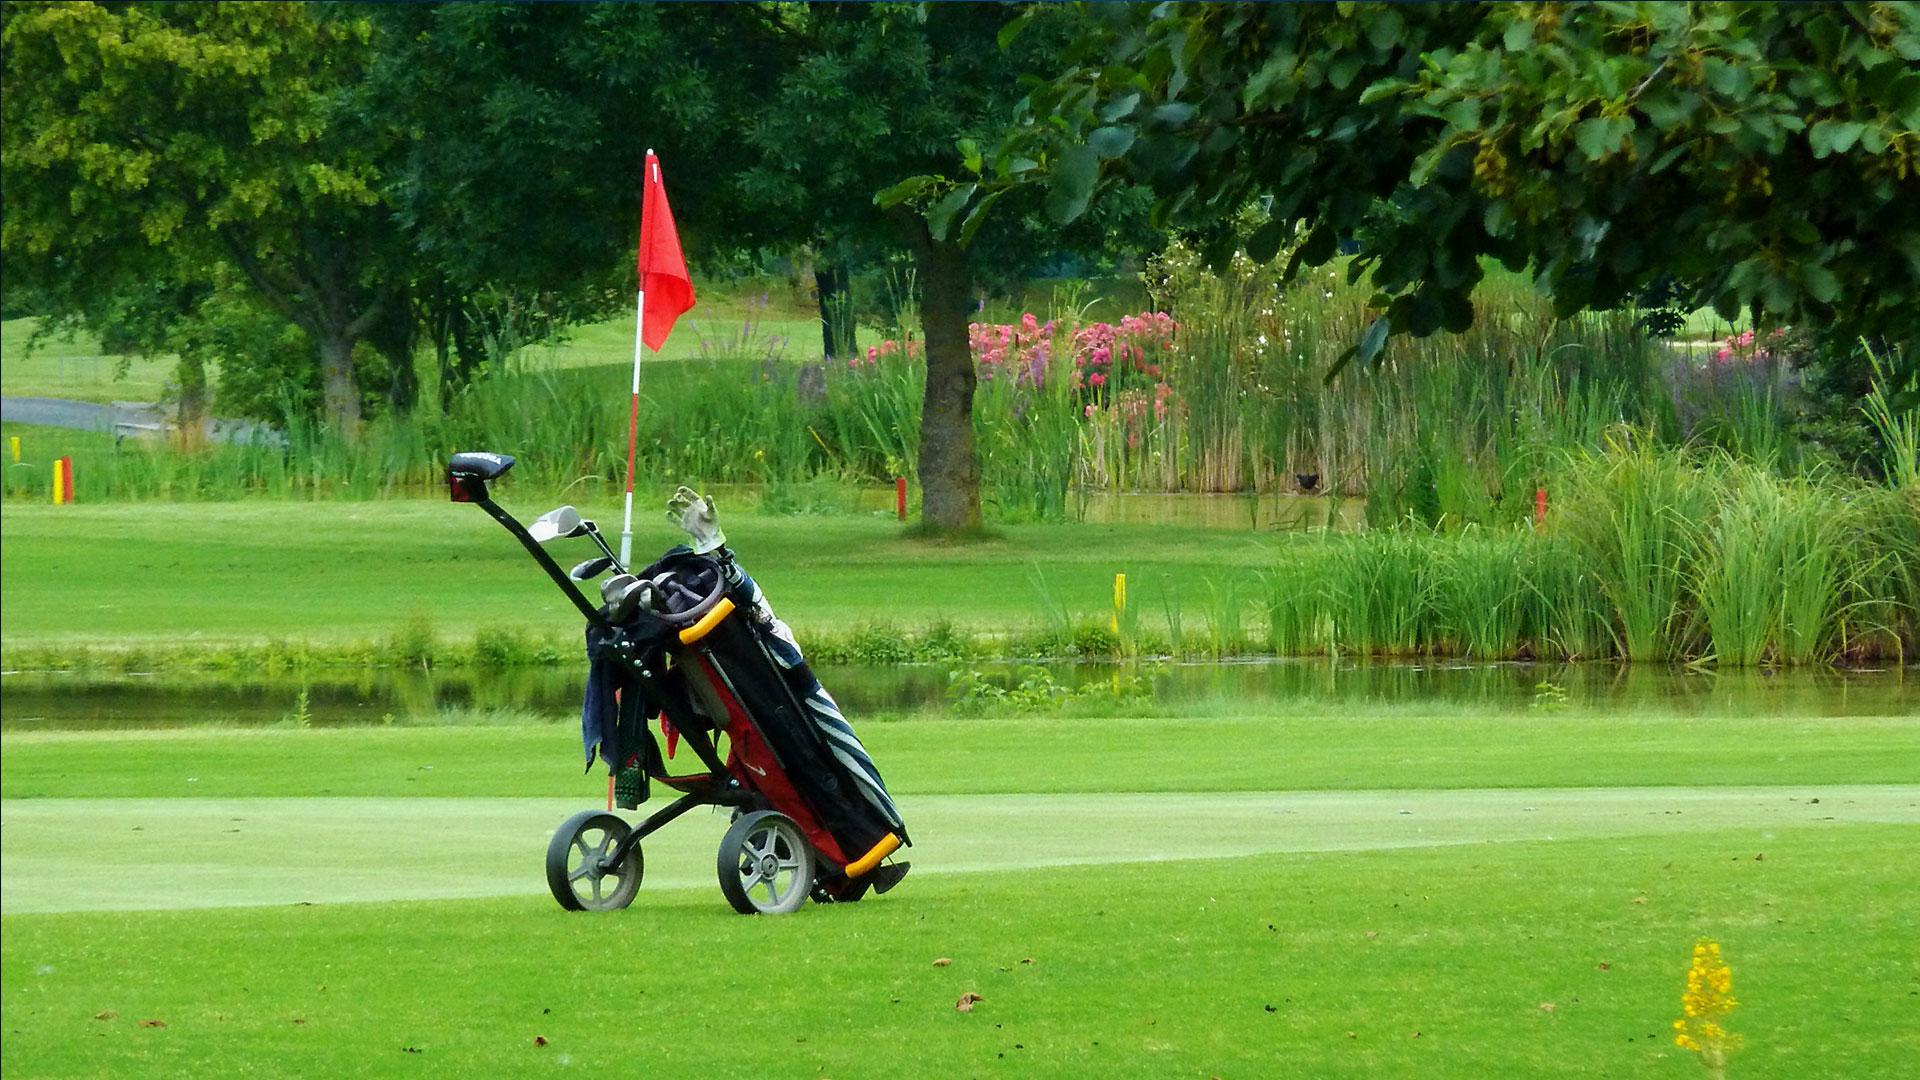 KELO-sports-generic-golf-4_1529437985578.jpg